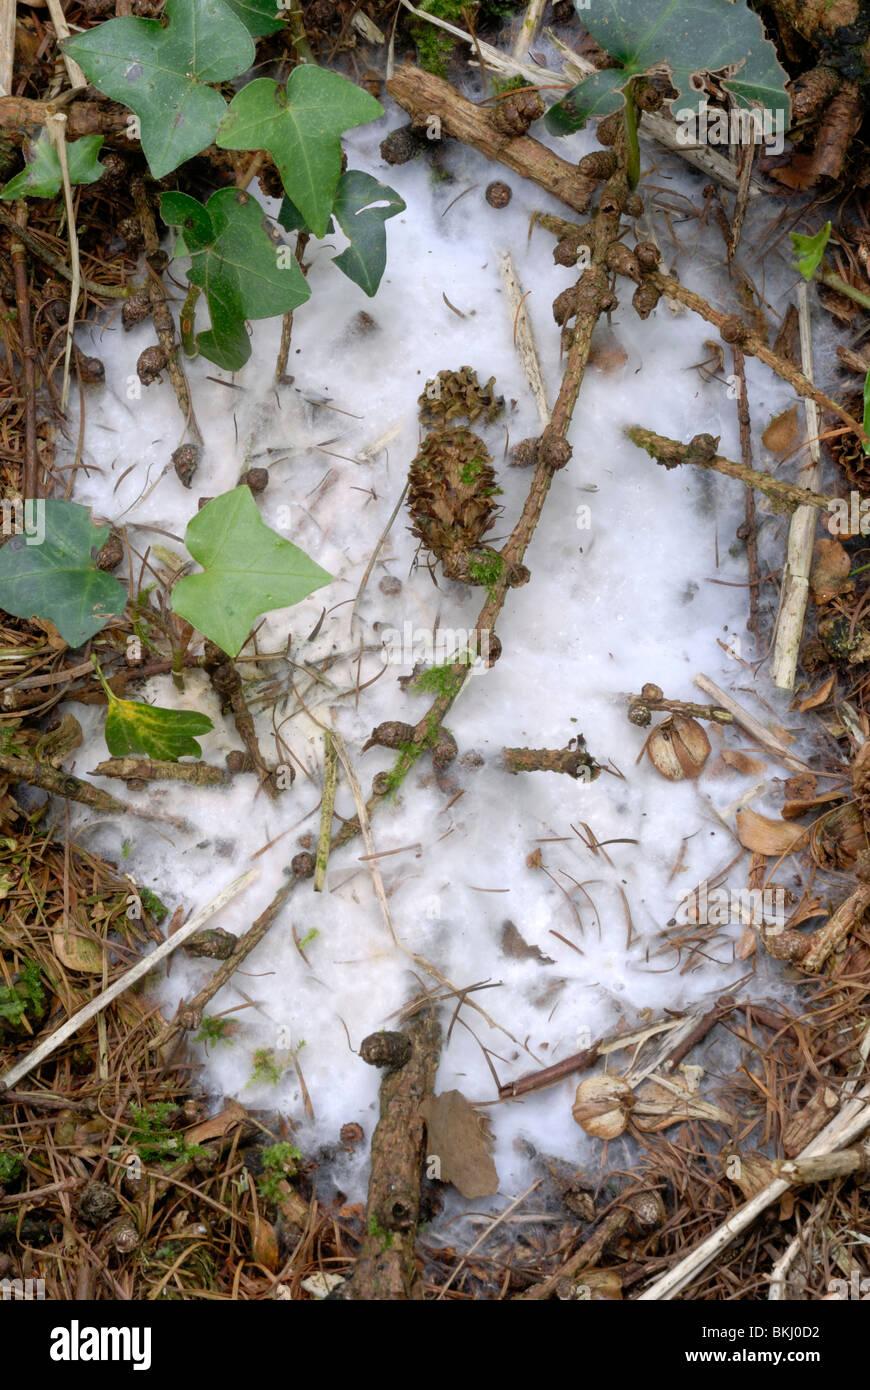 White fungal mycelium on the woodland floor, Wales. - Stock Image